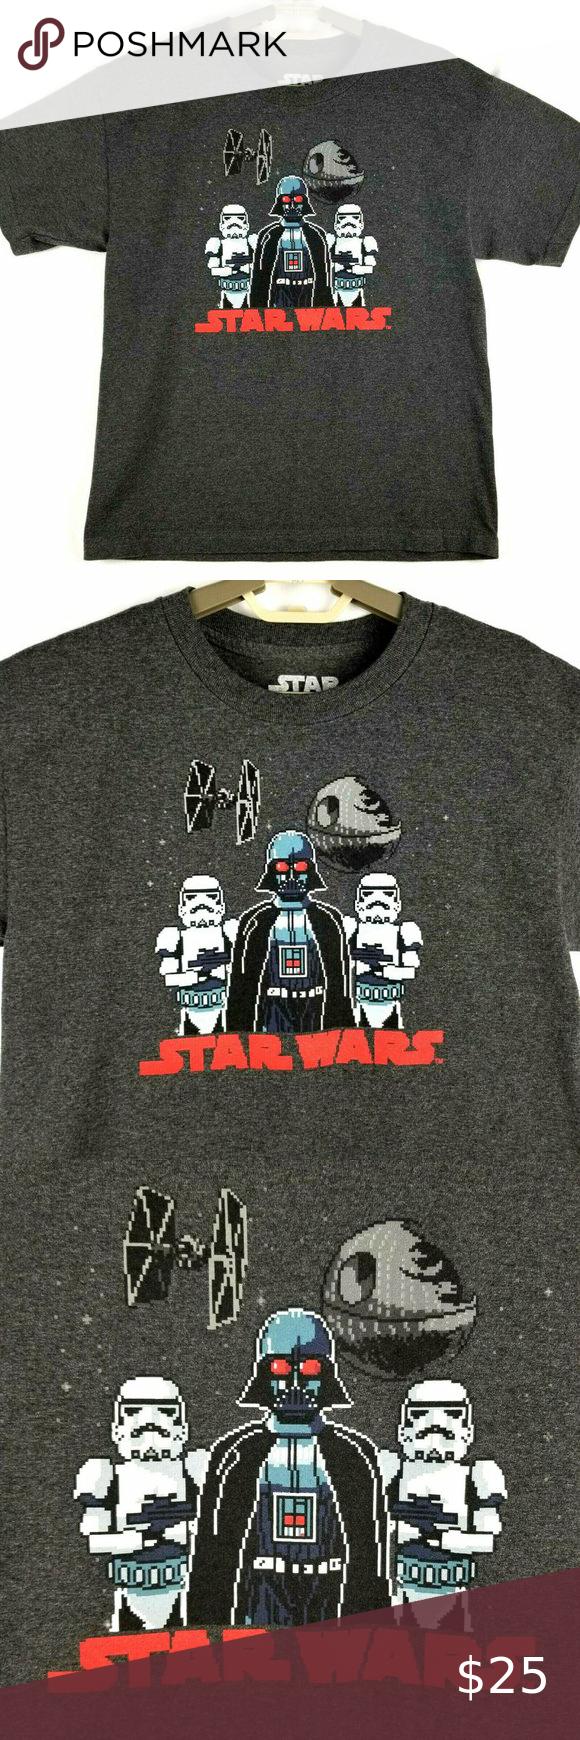 Star Wars Mens Tee Darth Vader Storm Troopers Mens Tees Mens Tshirts Men [ 1740 x 580 Pixel ]